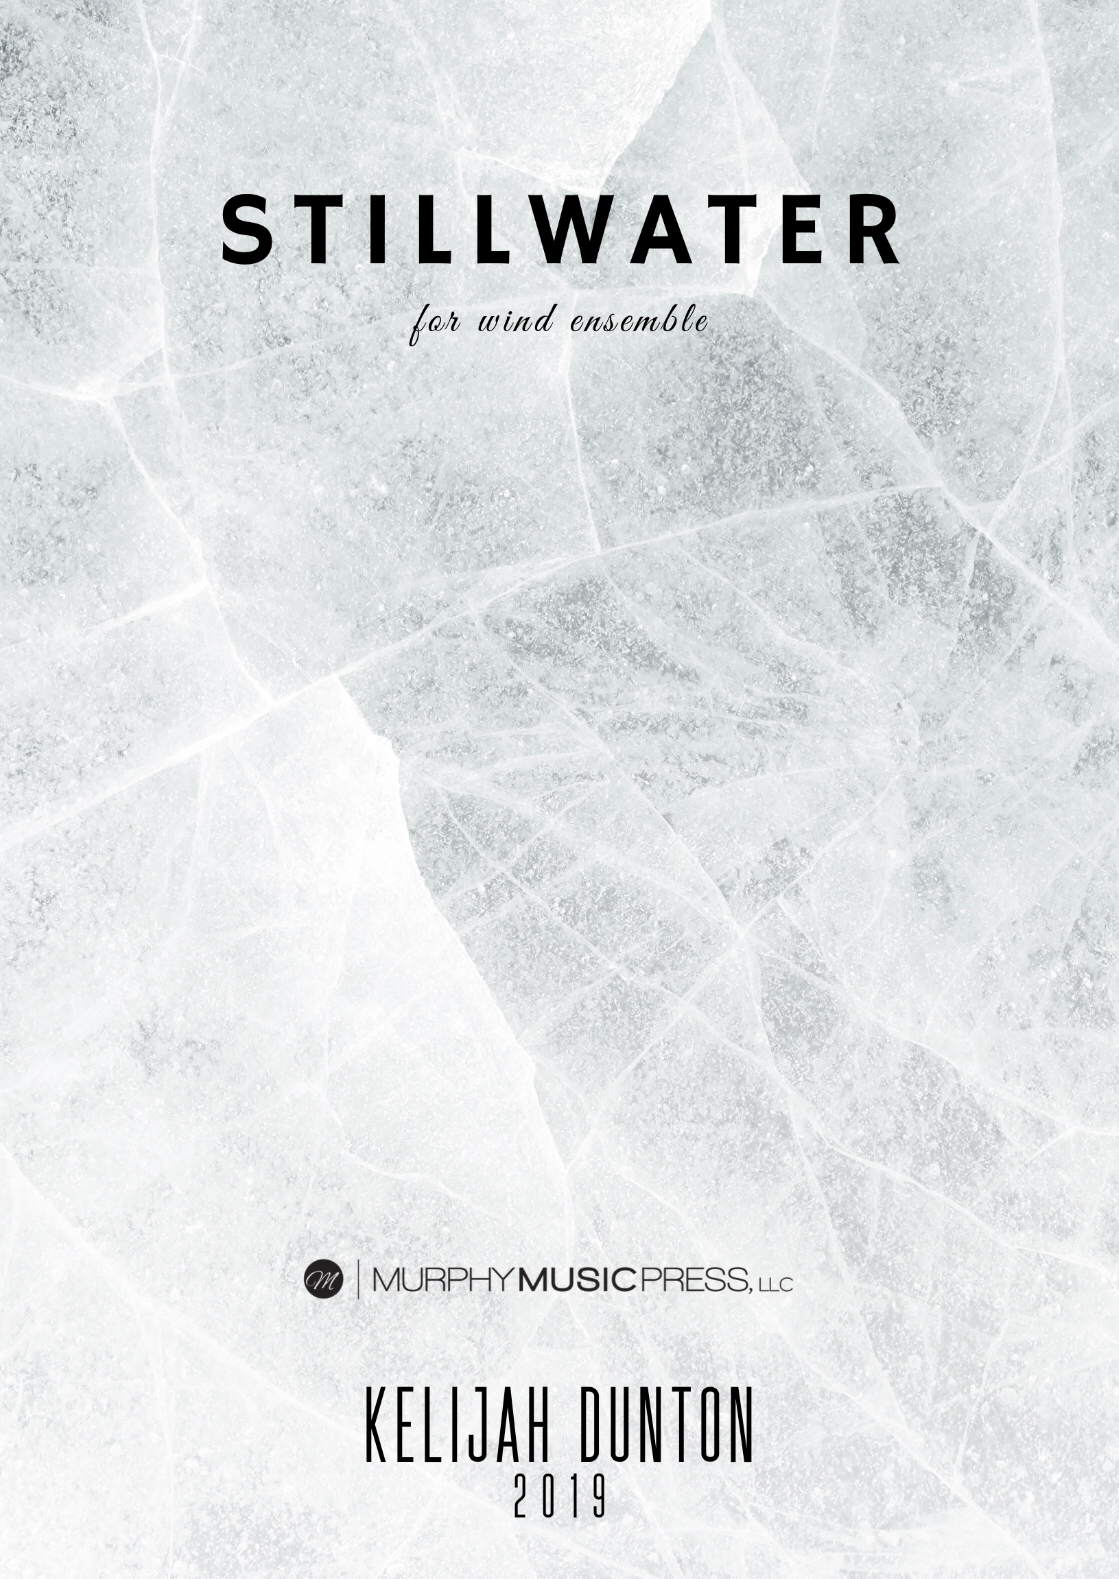 Stillwater by Kelijah Dunton